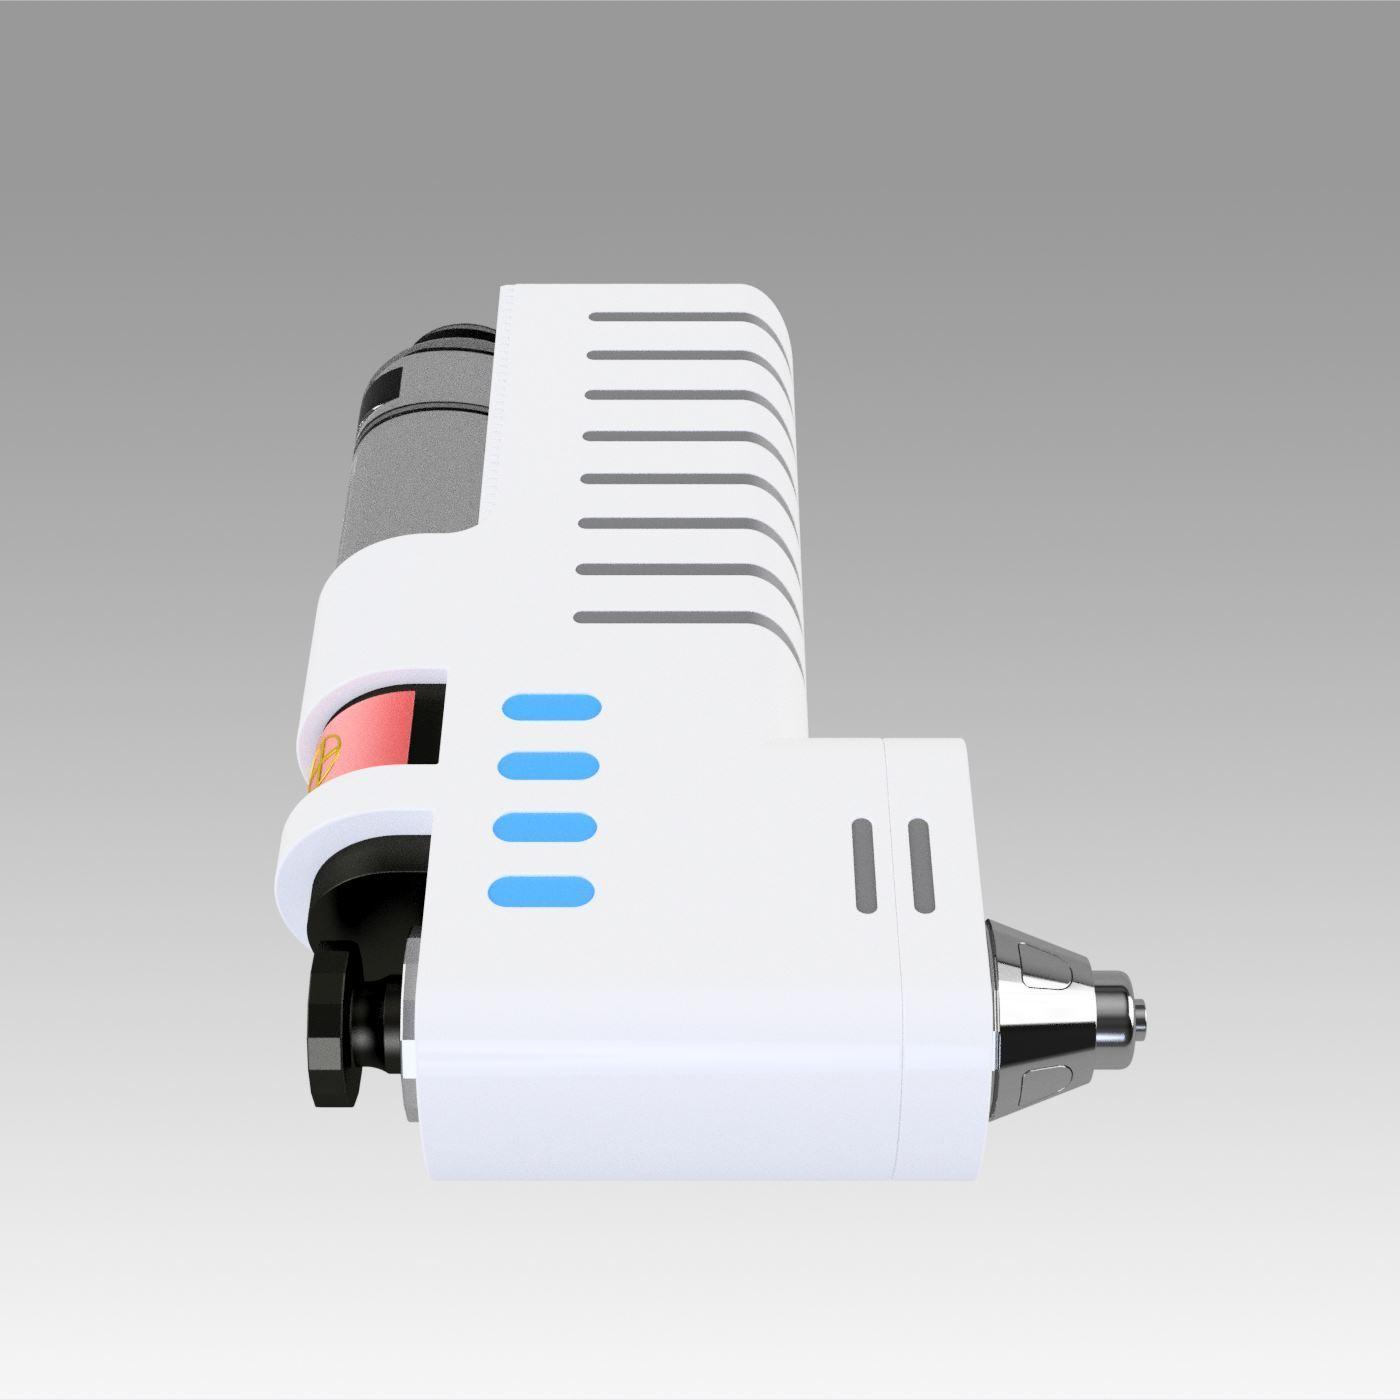 5.jpg Download OBJ file Star Trek Discovery Hypo Spray replica prop cosplay • 3D printable model, Blackeveryday